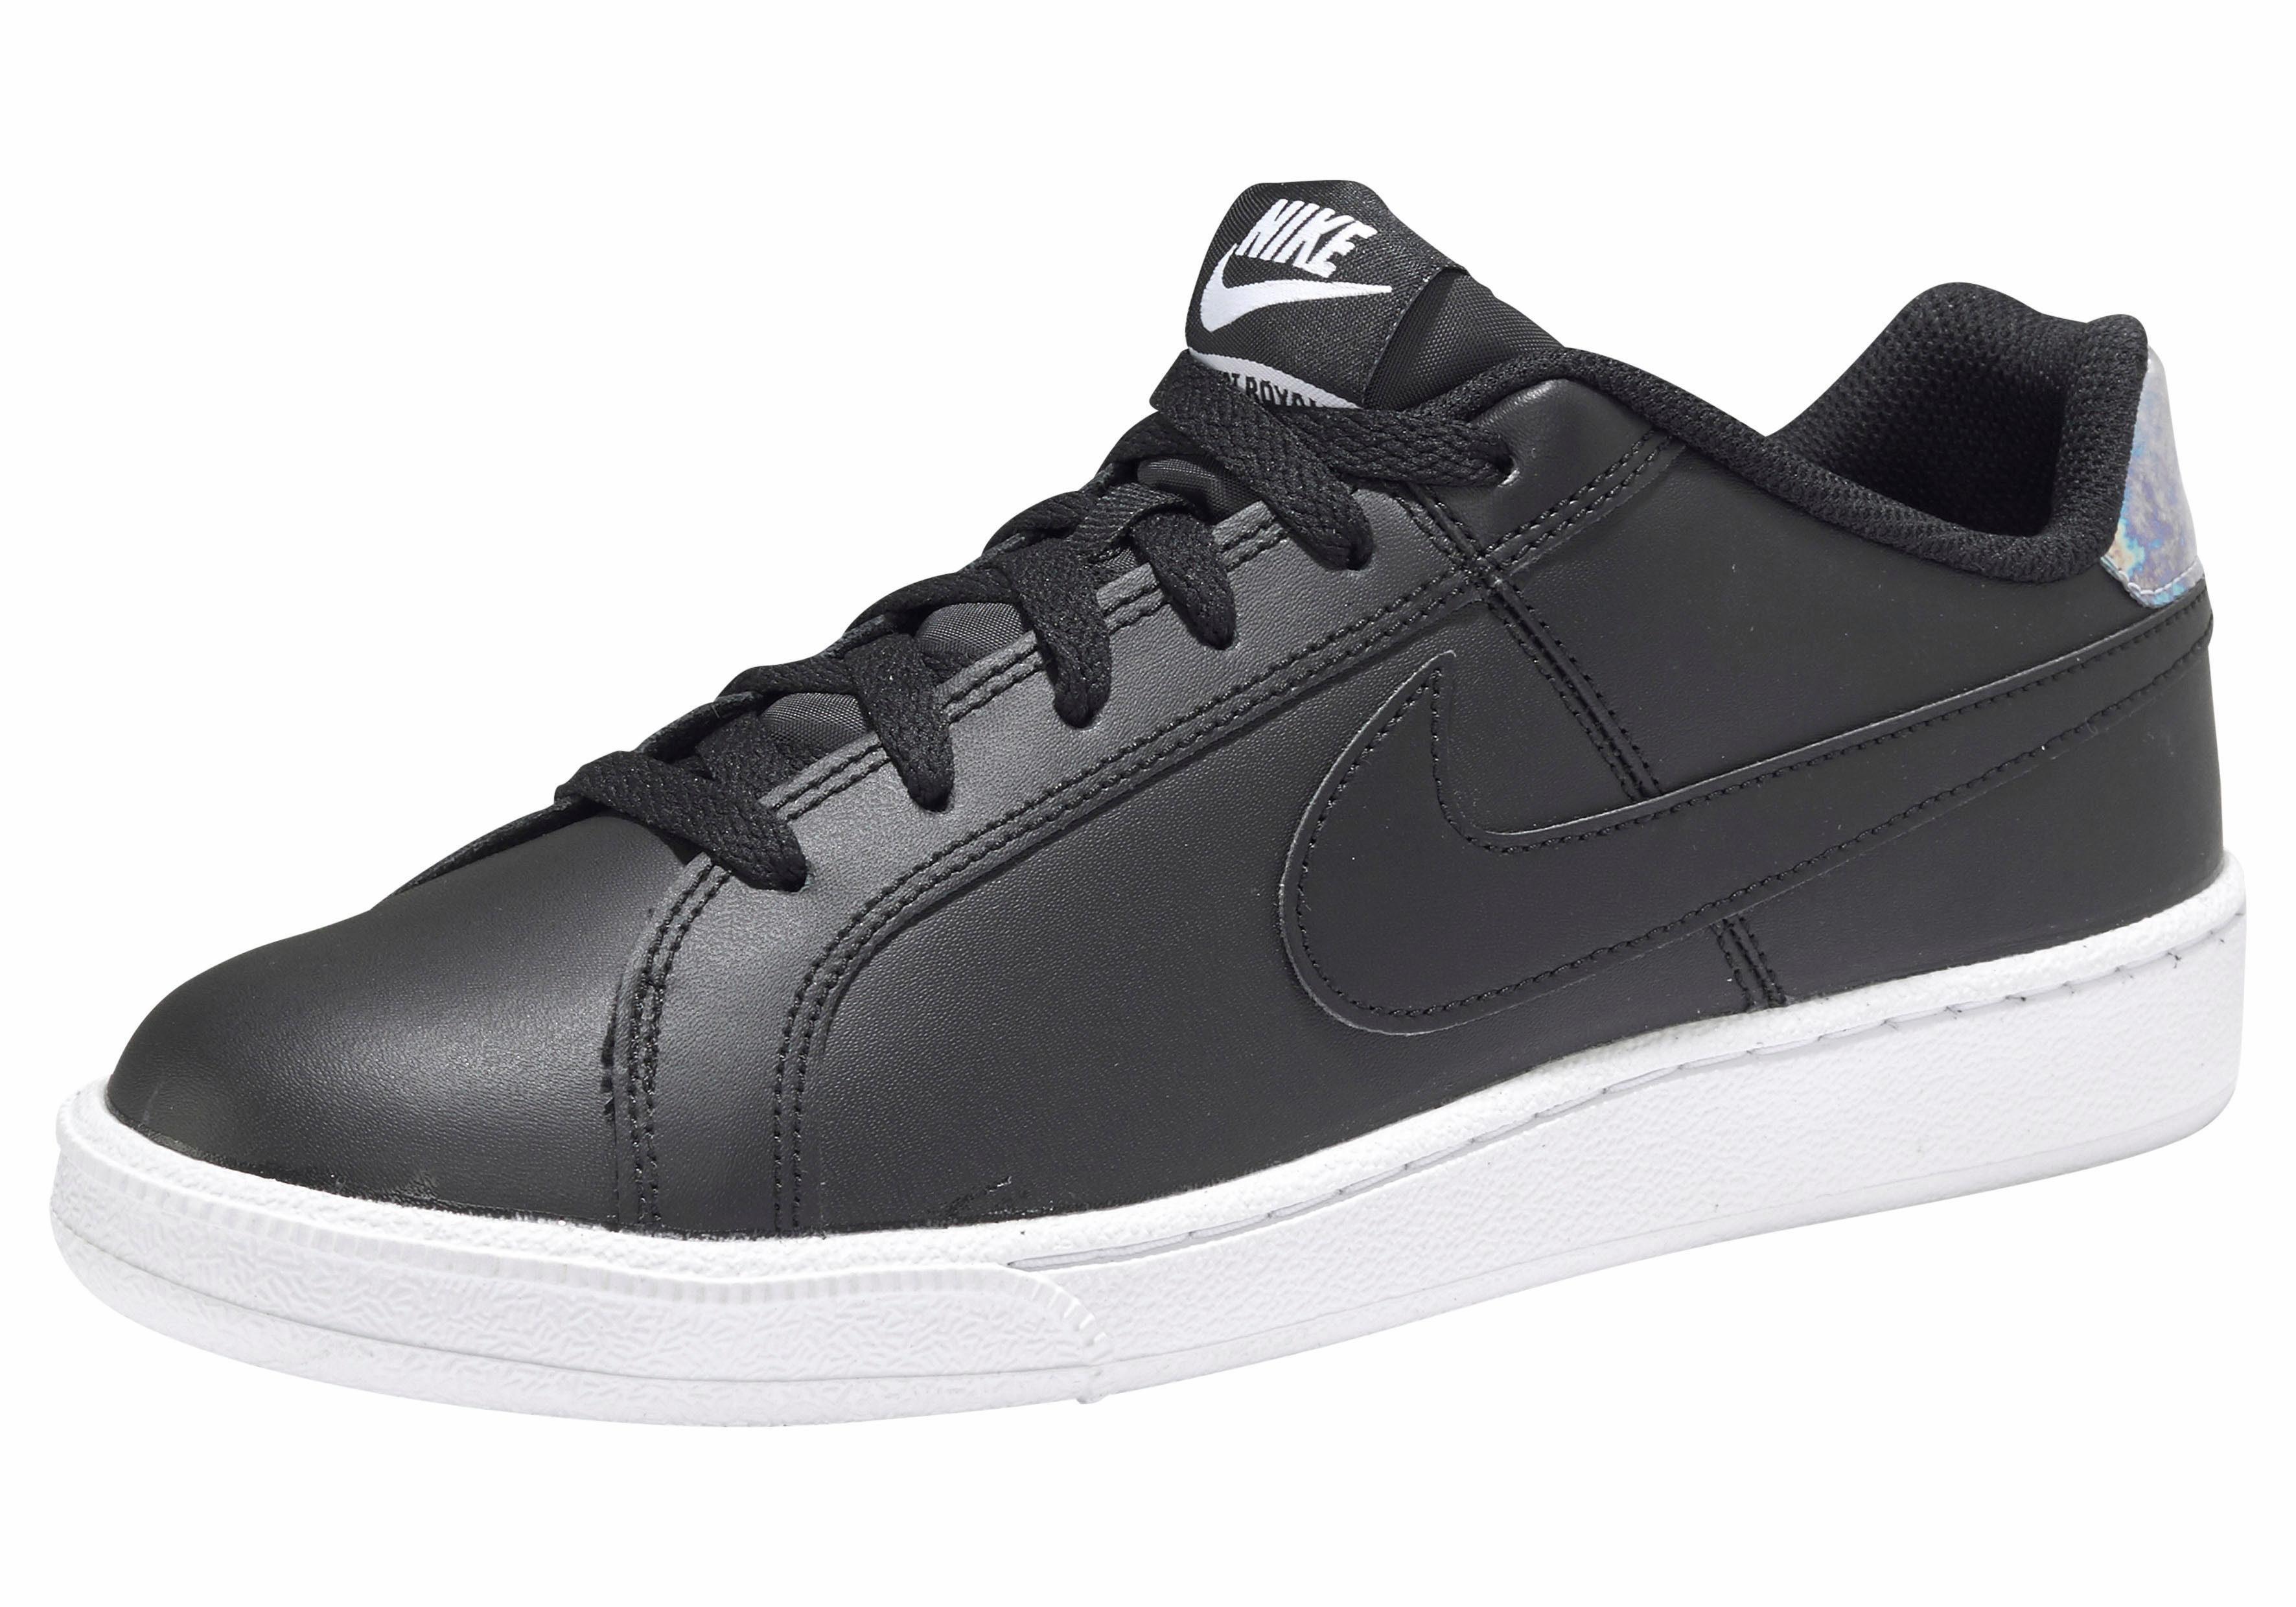 Nike Sportswear Wmns Court Royale metallic Sneaker online kaufen  schwarz-silberfarben